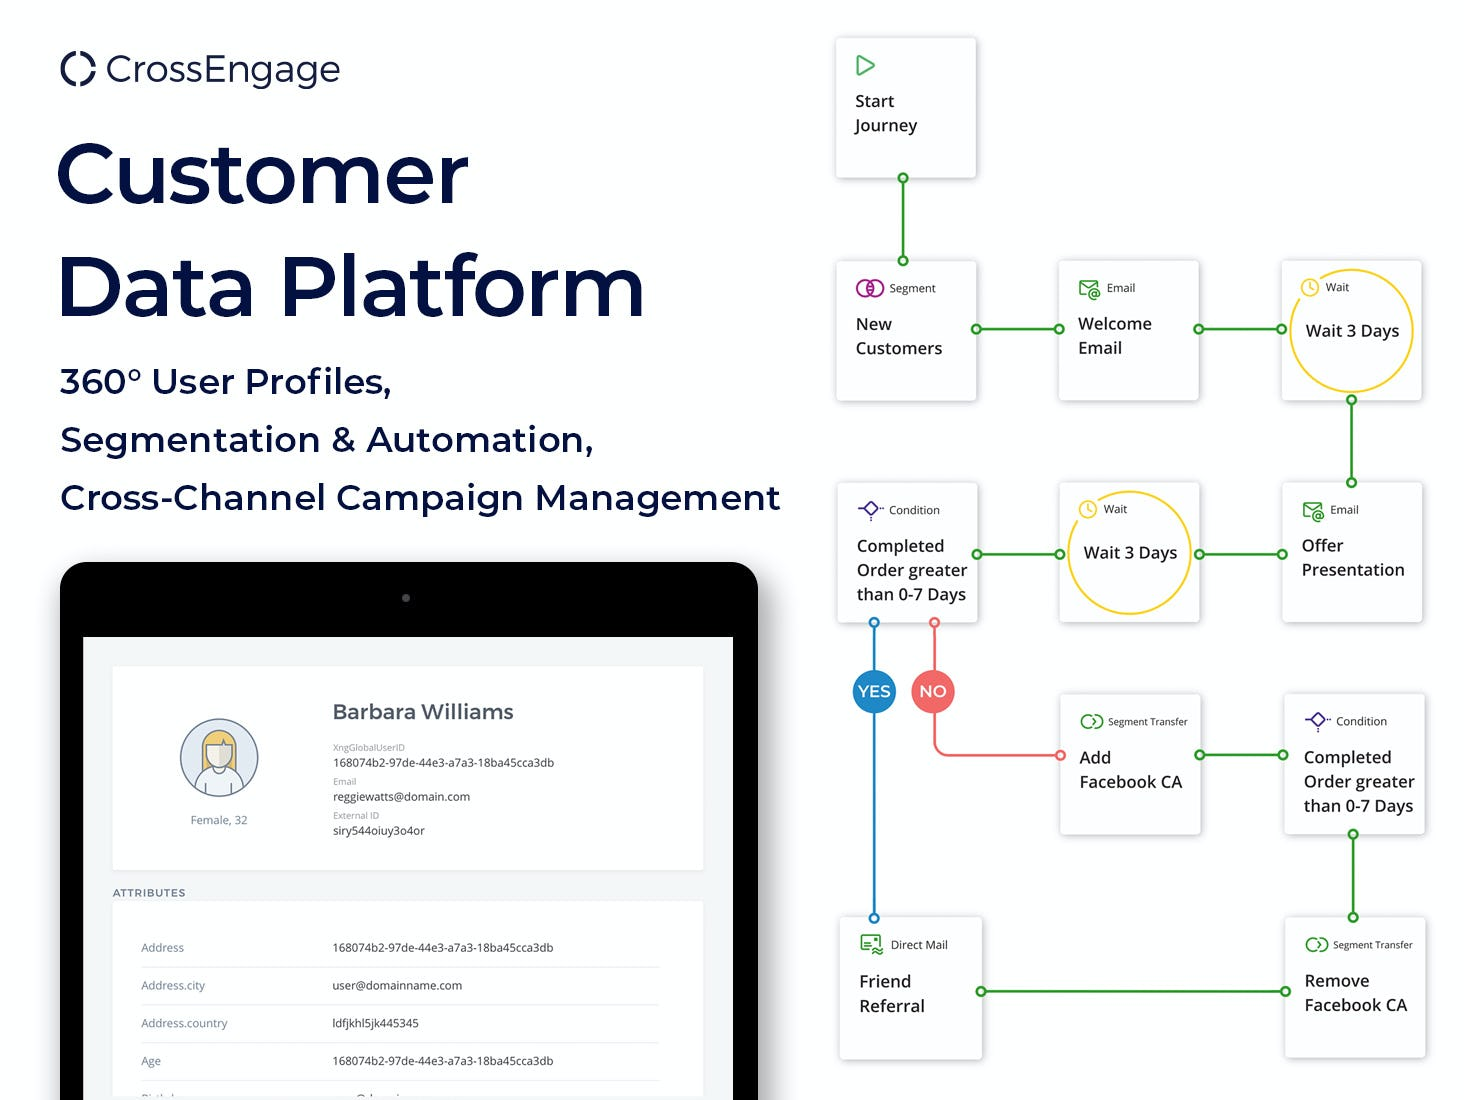 CrossEngage Software - Customer Data Platform